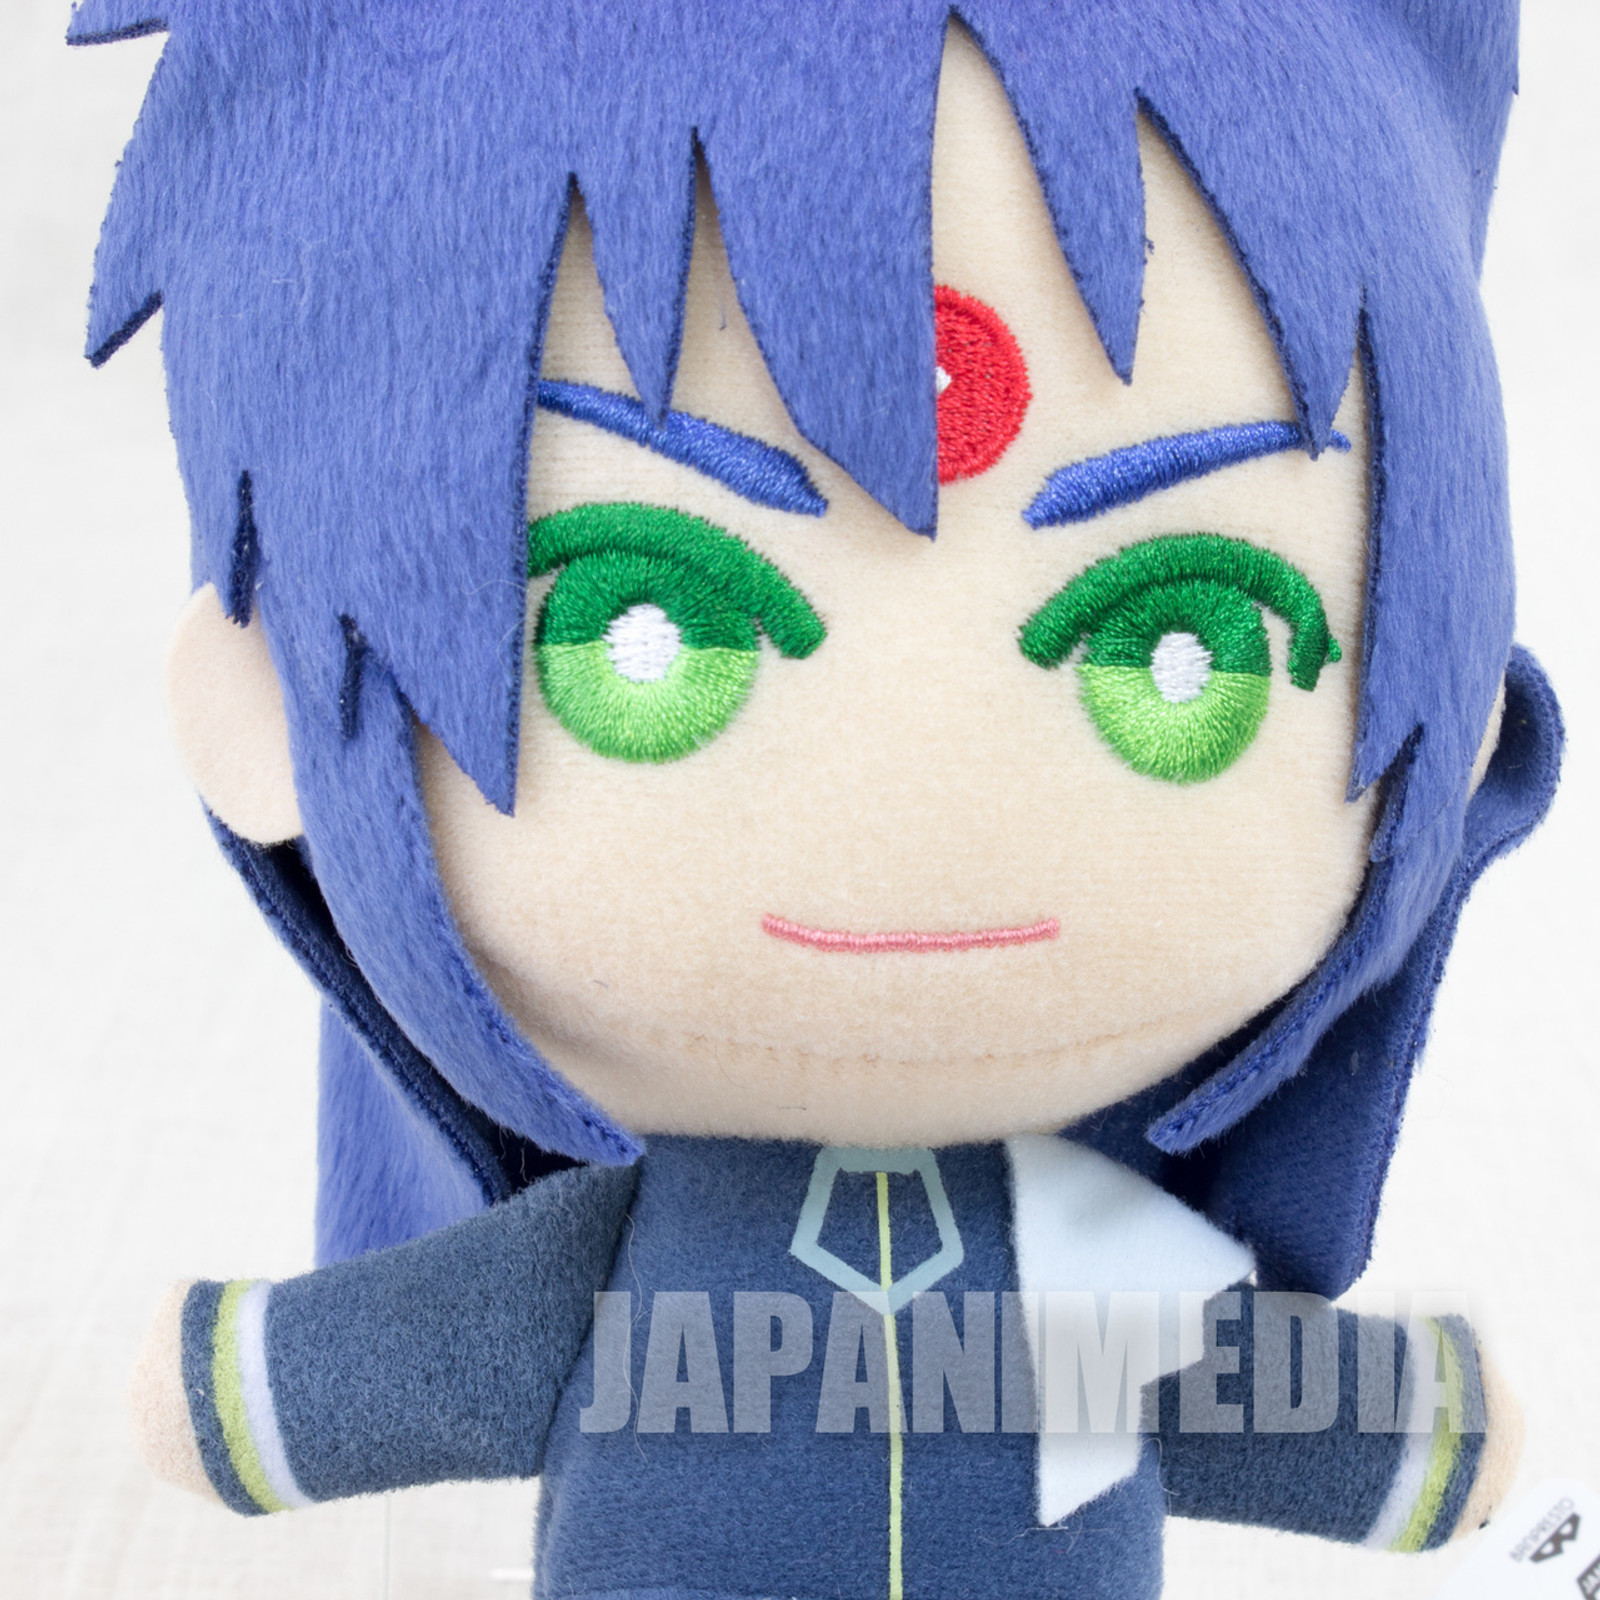 Hakyu Hoshin Engi Yozen Tomo-nui Plush doll JAPAN ANIME MANGA